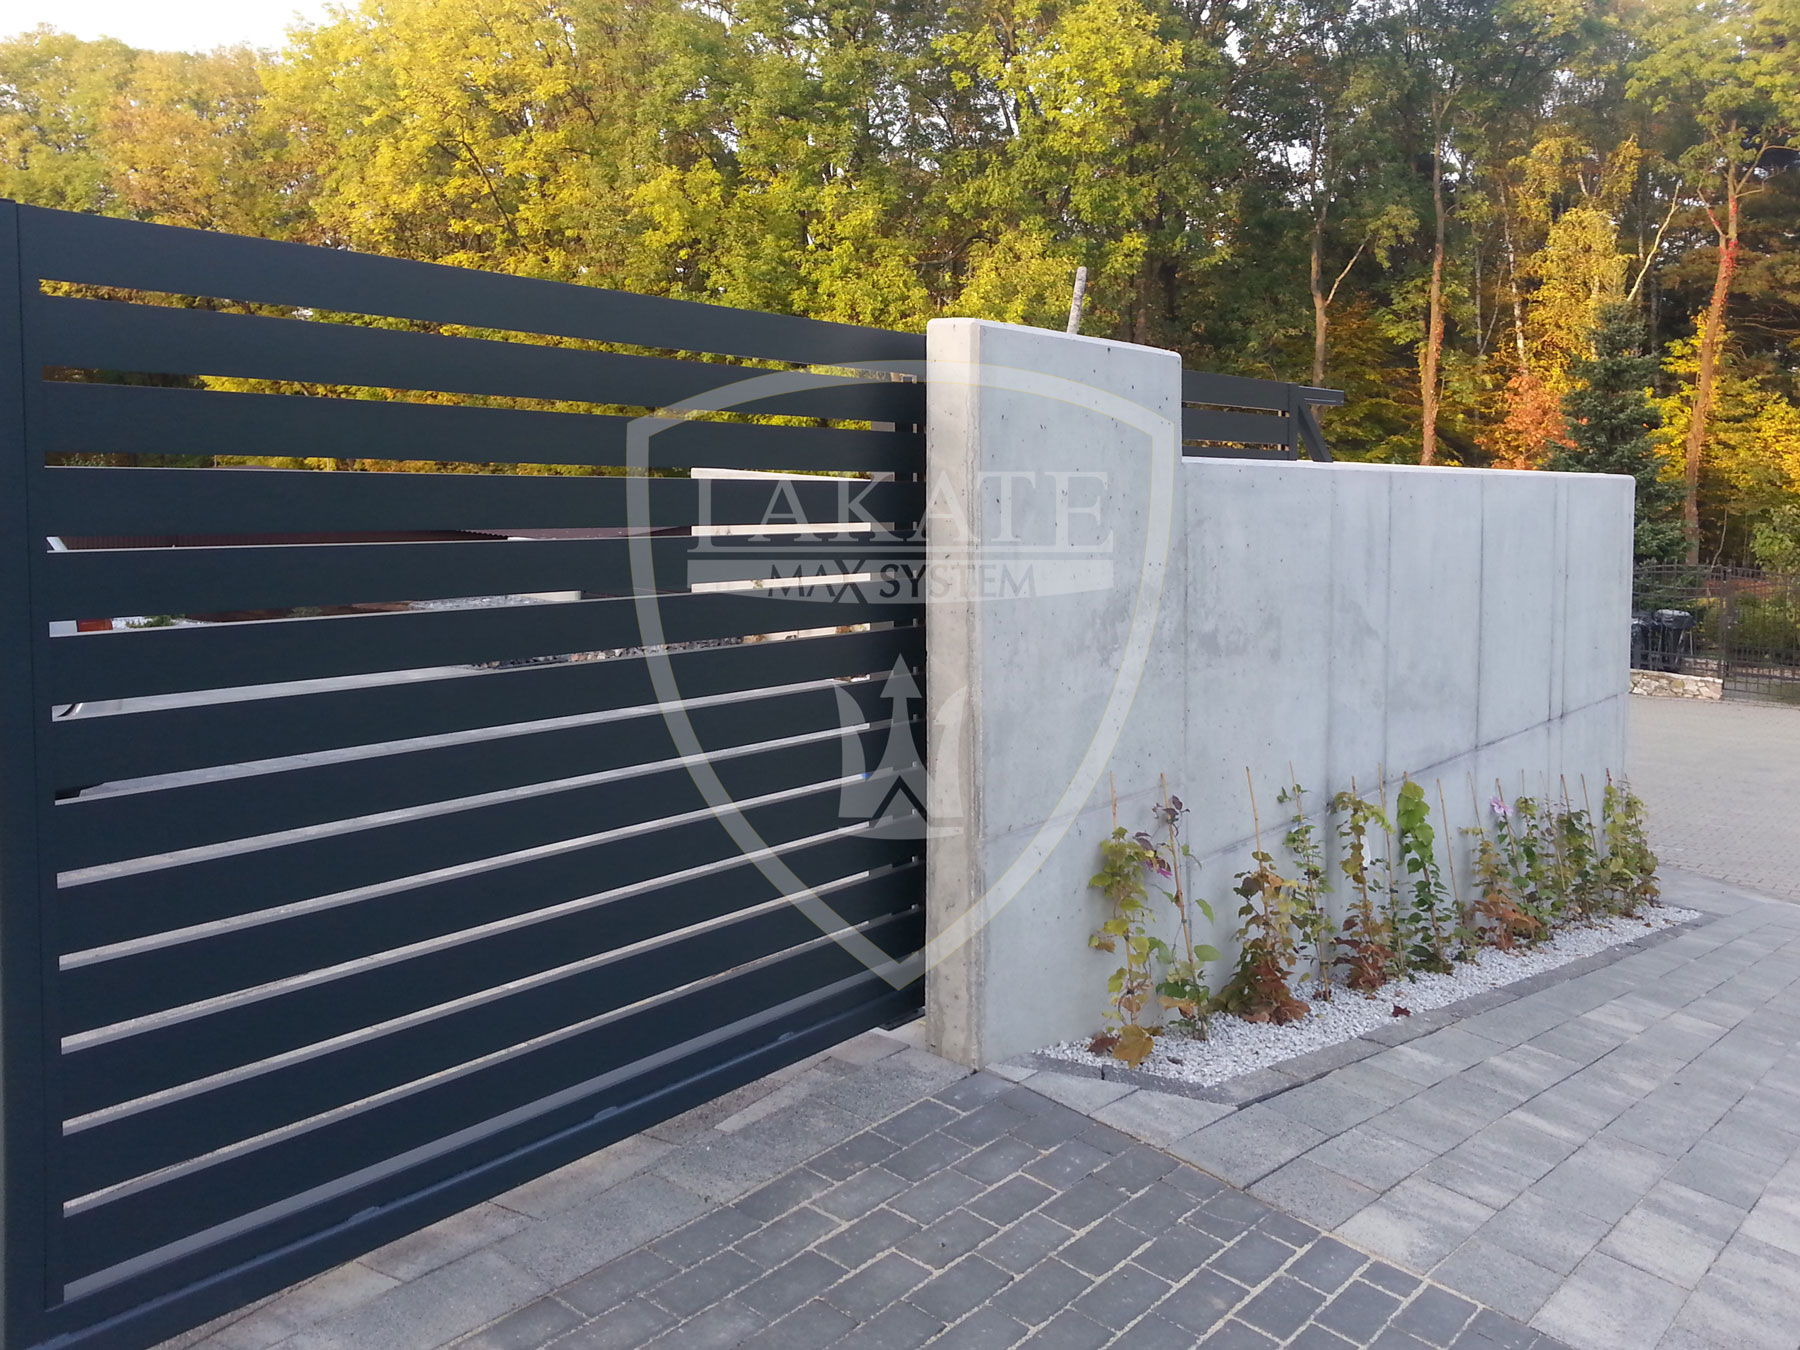 Brama przesuwna lakate osadzona na betonie architektonicznym